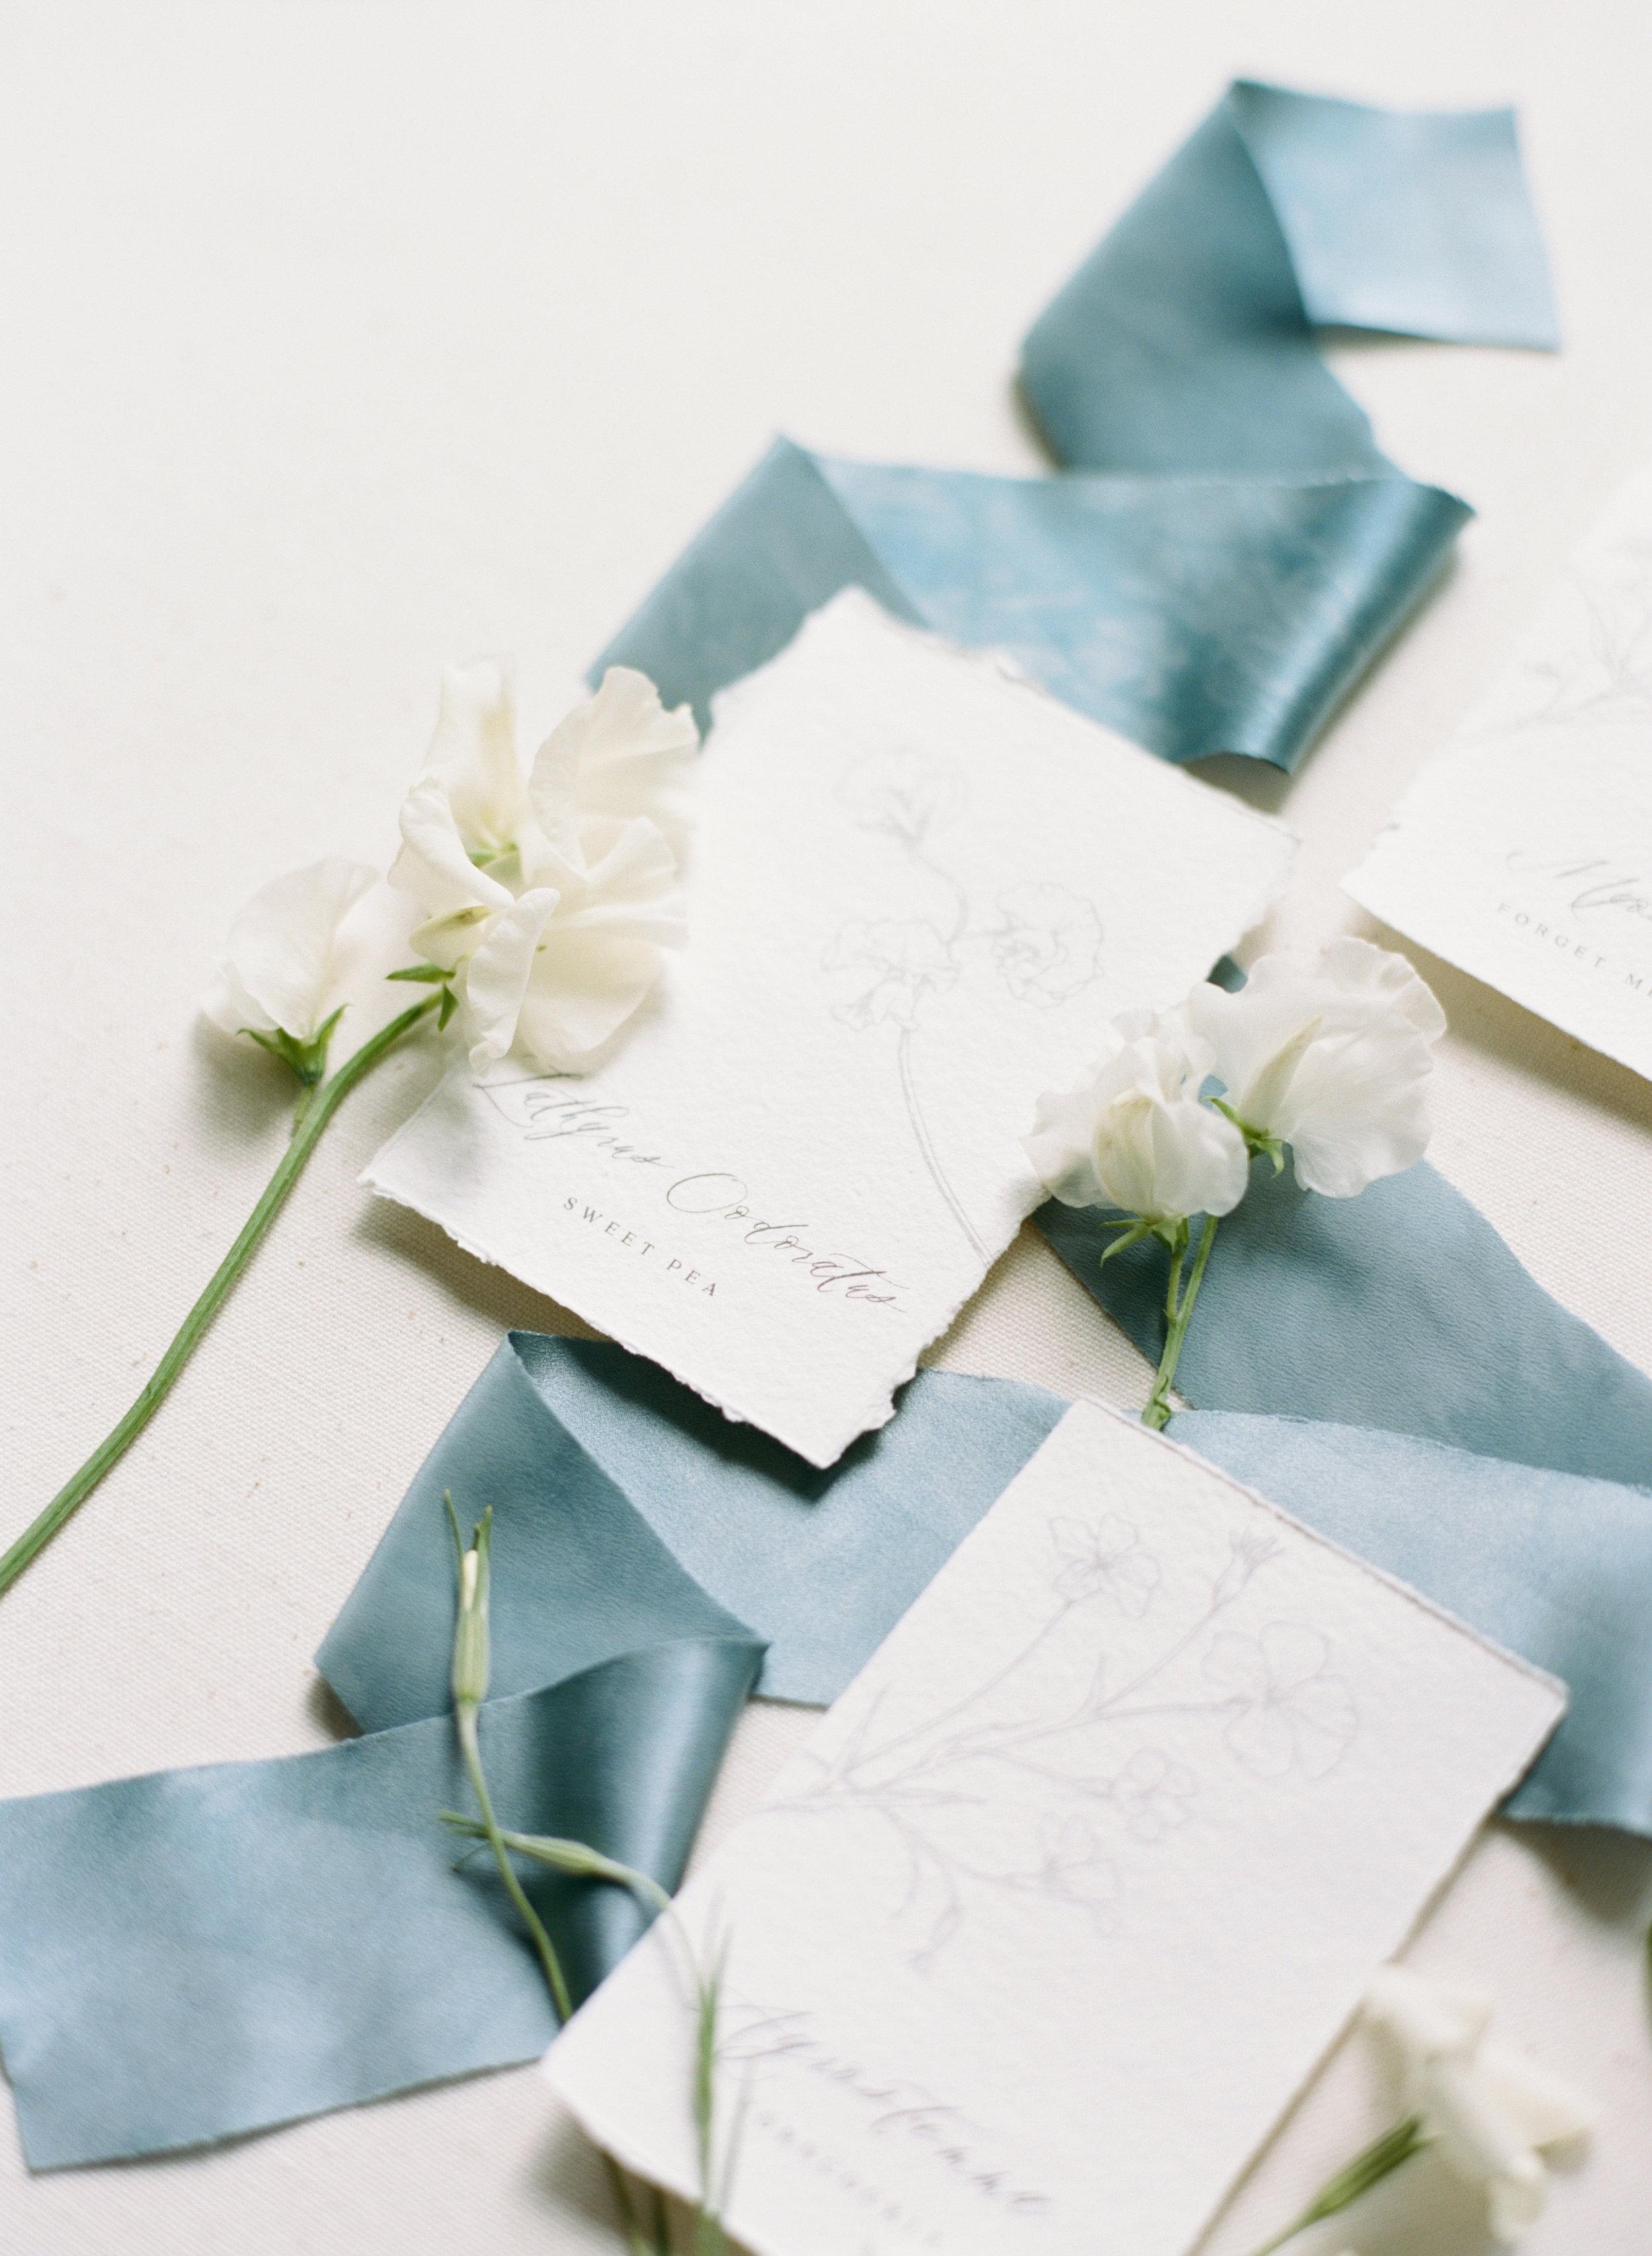 alexandra-meseke-understated-soft-luxury-wedding-upstate-ny_0017.jpg